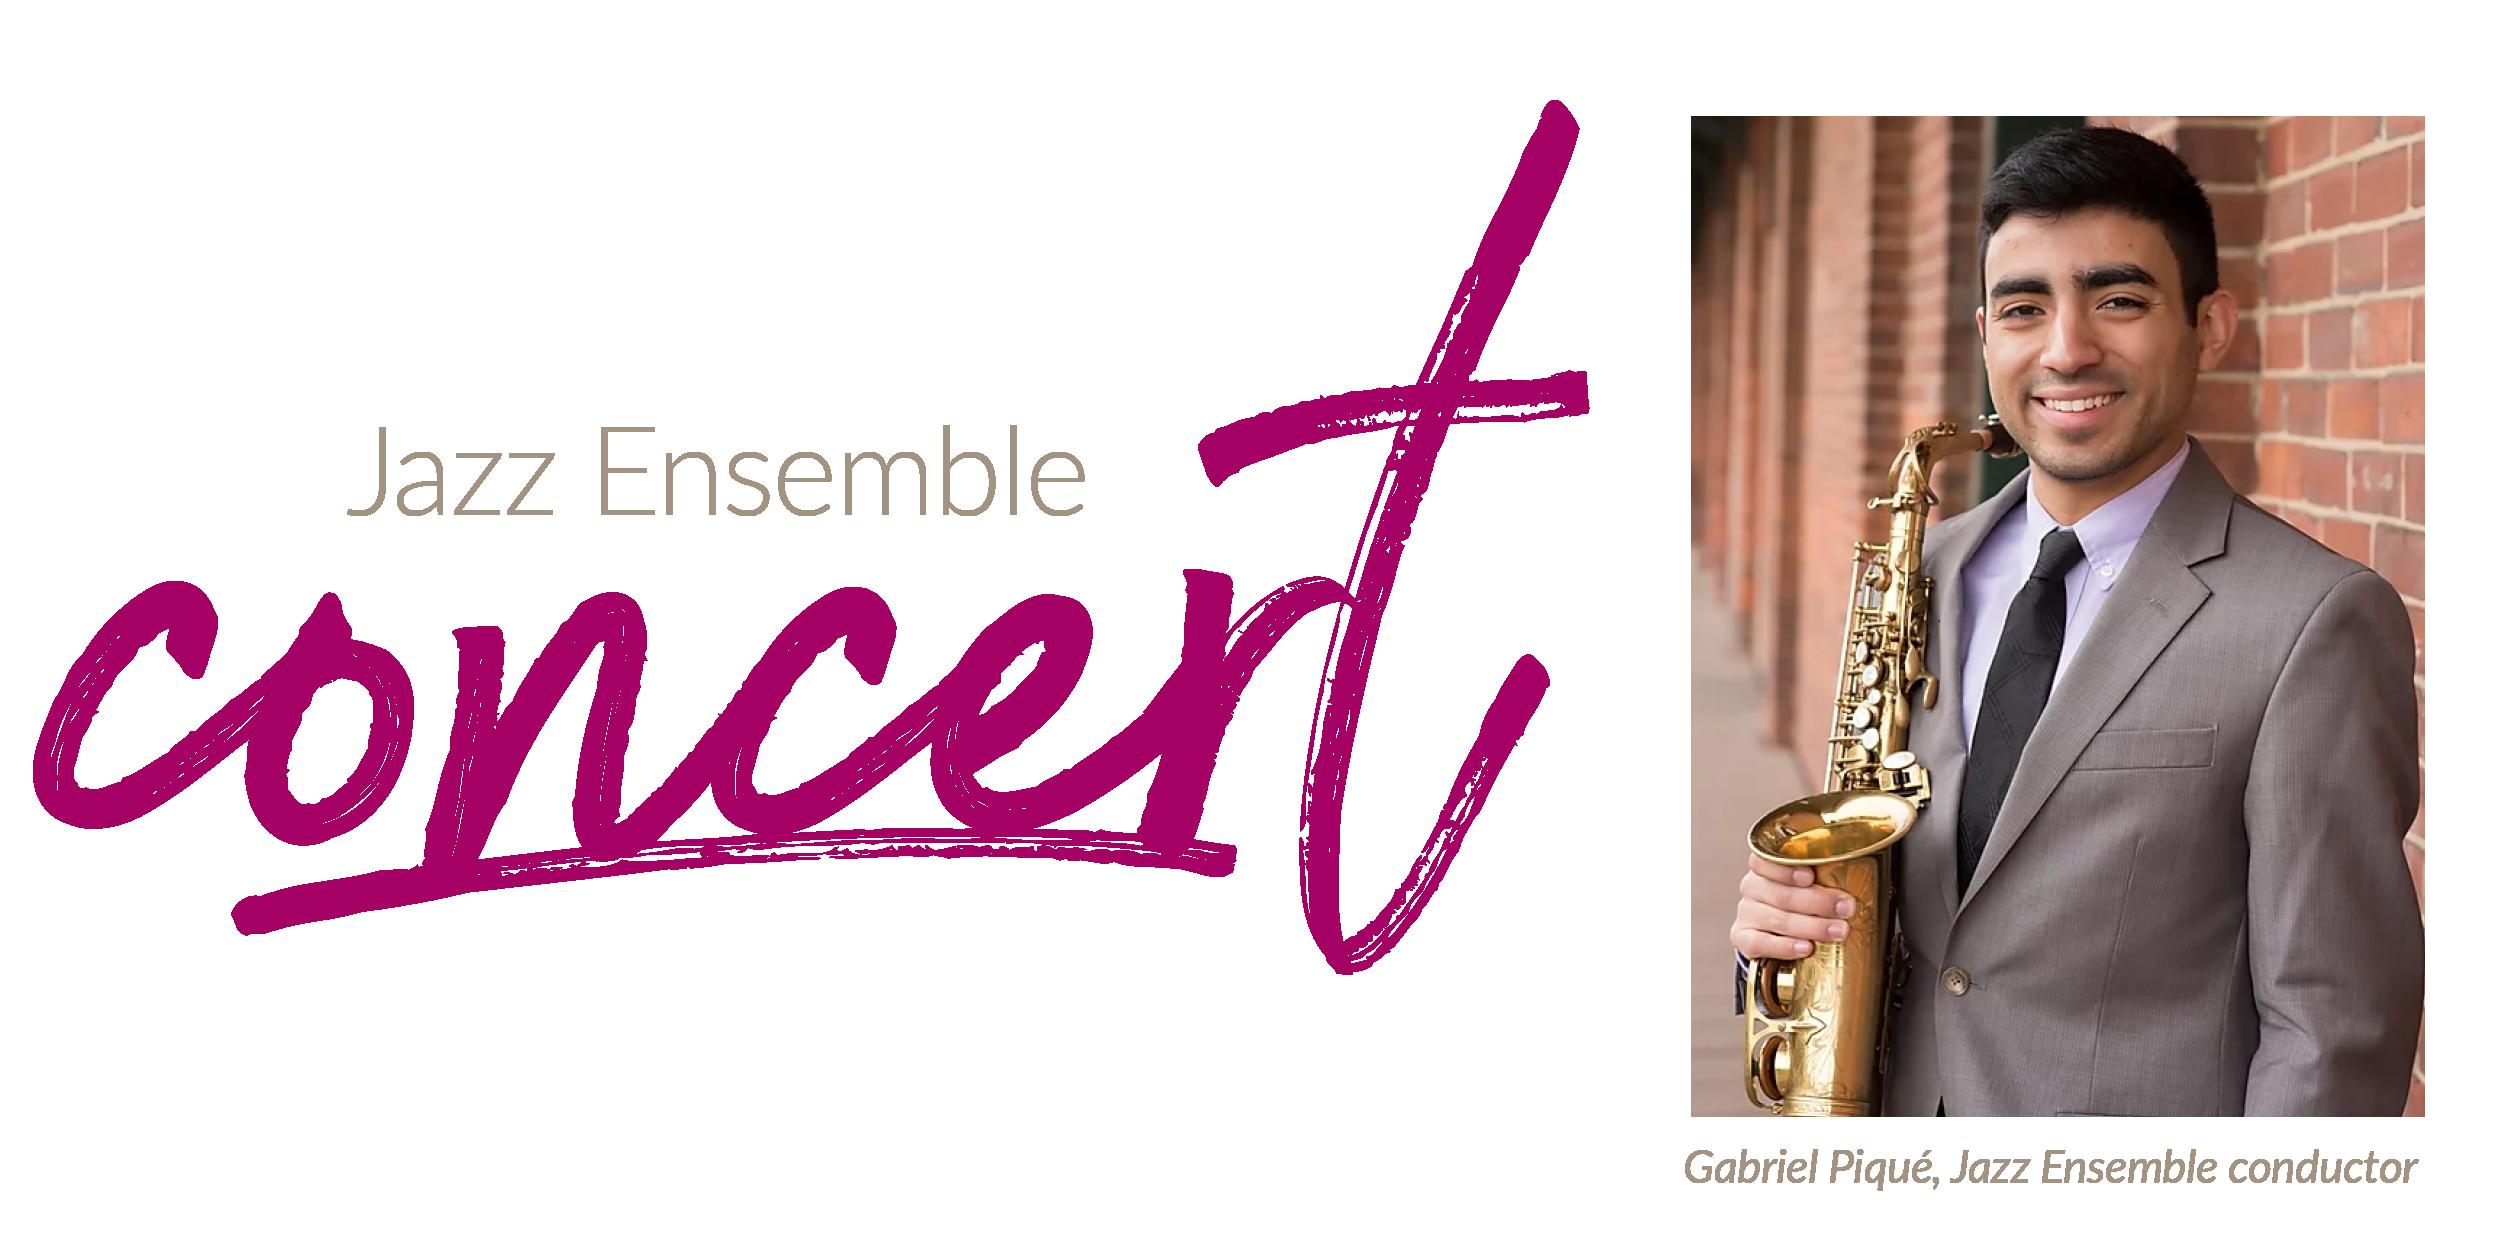 BW Jazz Ensemble Concert